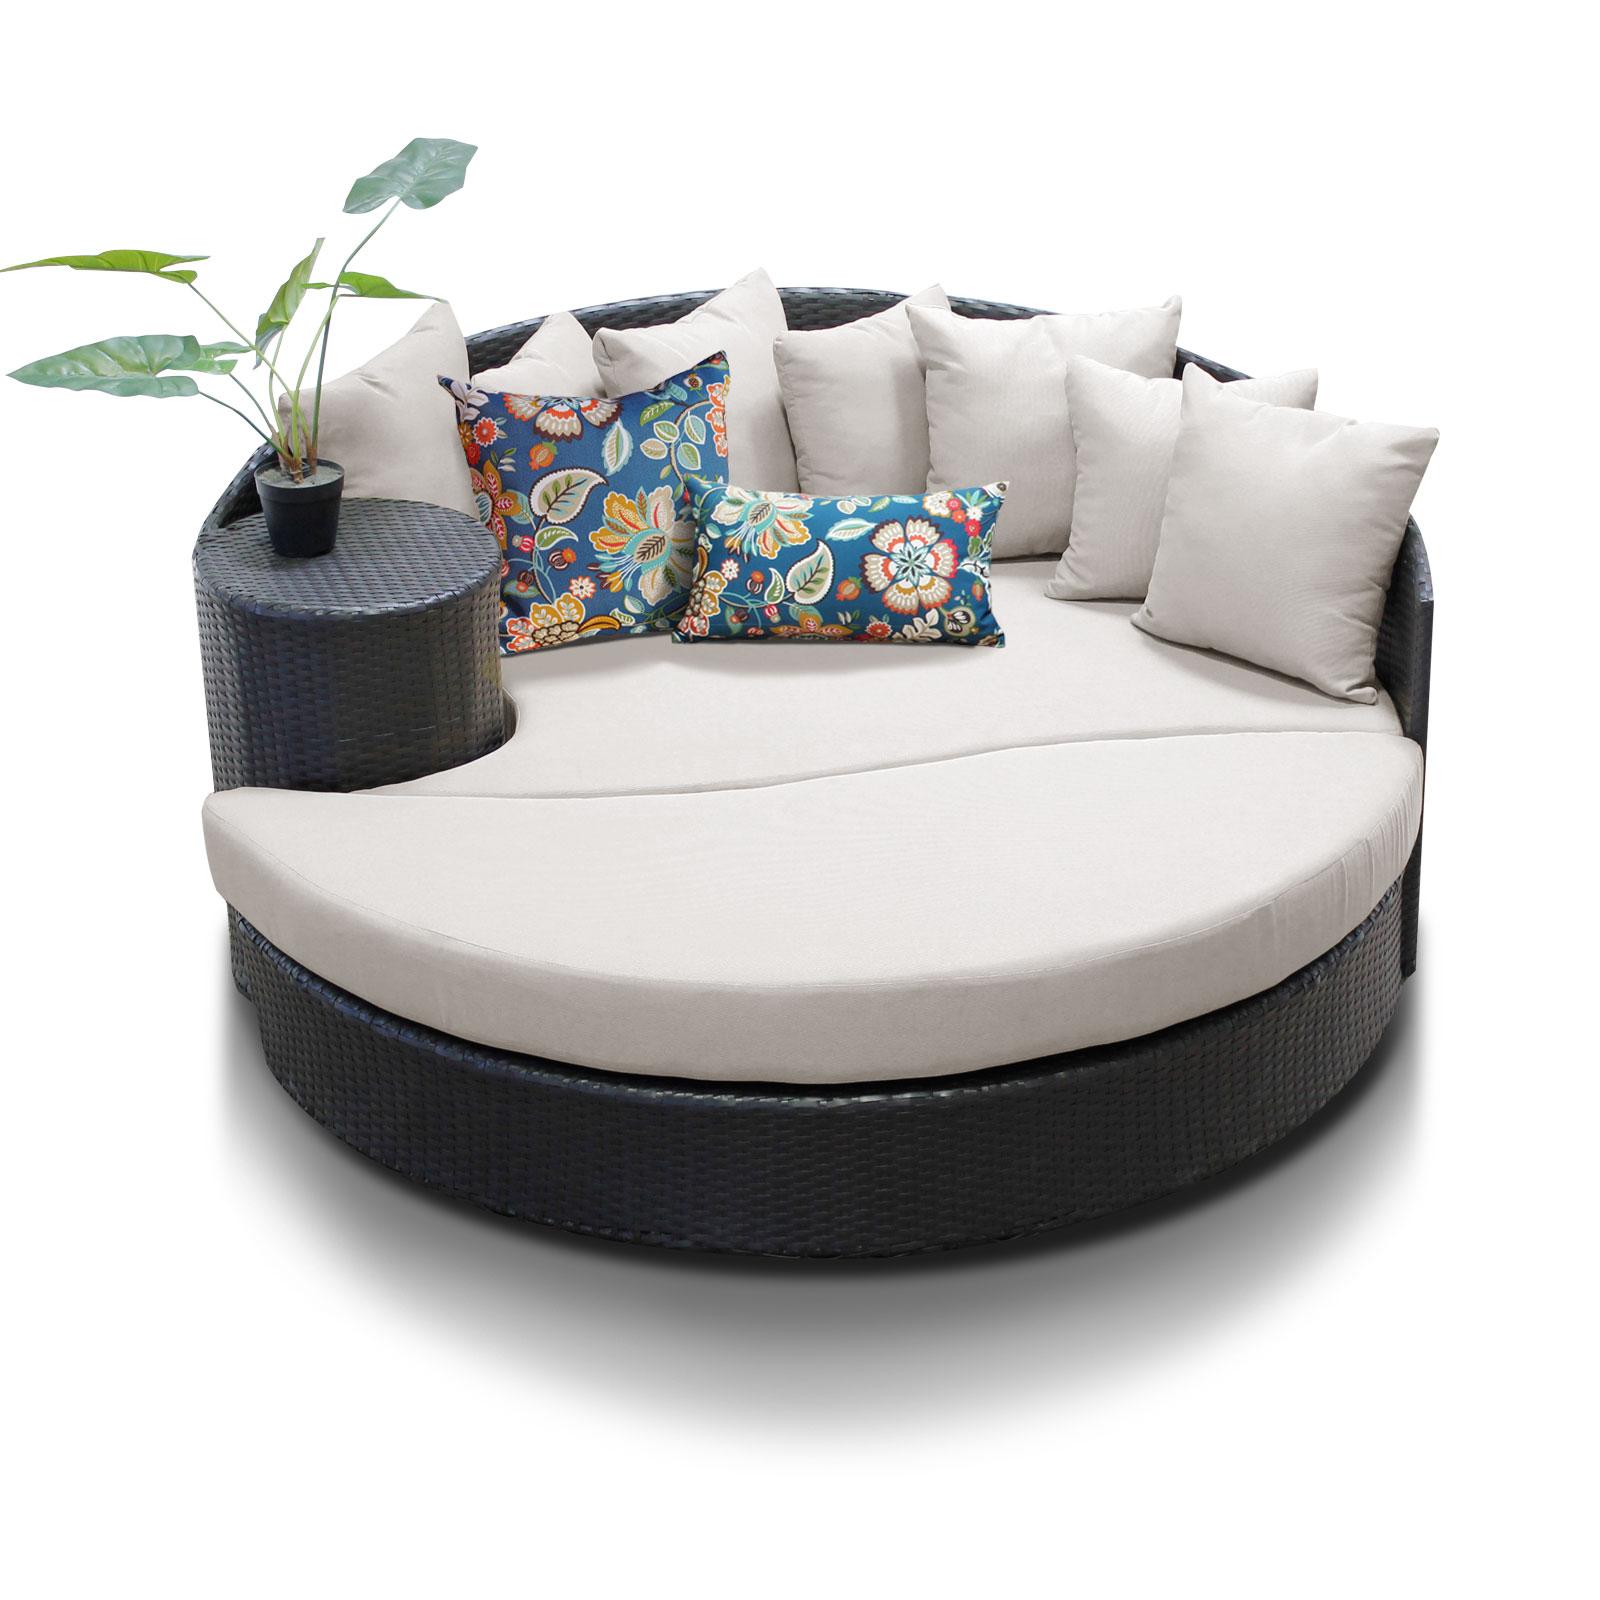 classics newport circular sun bed outdoor wicker patio furniture